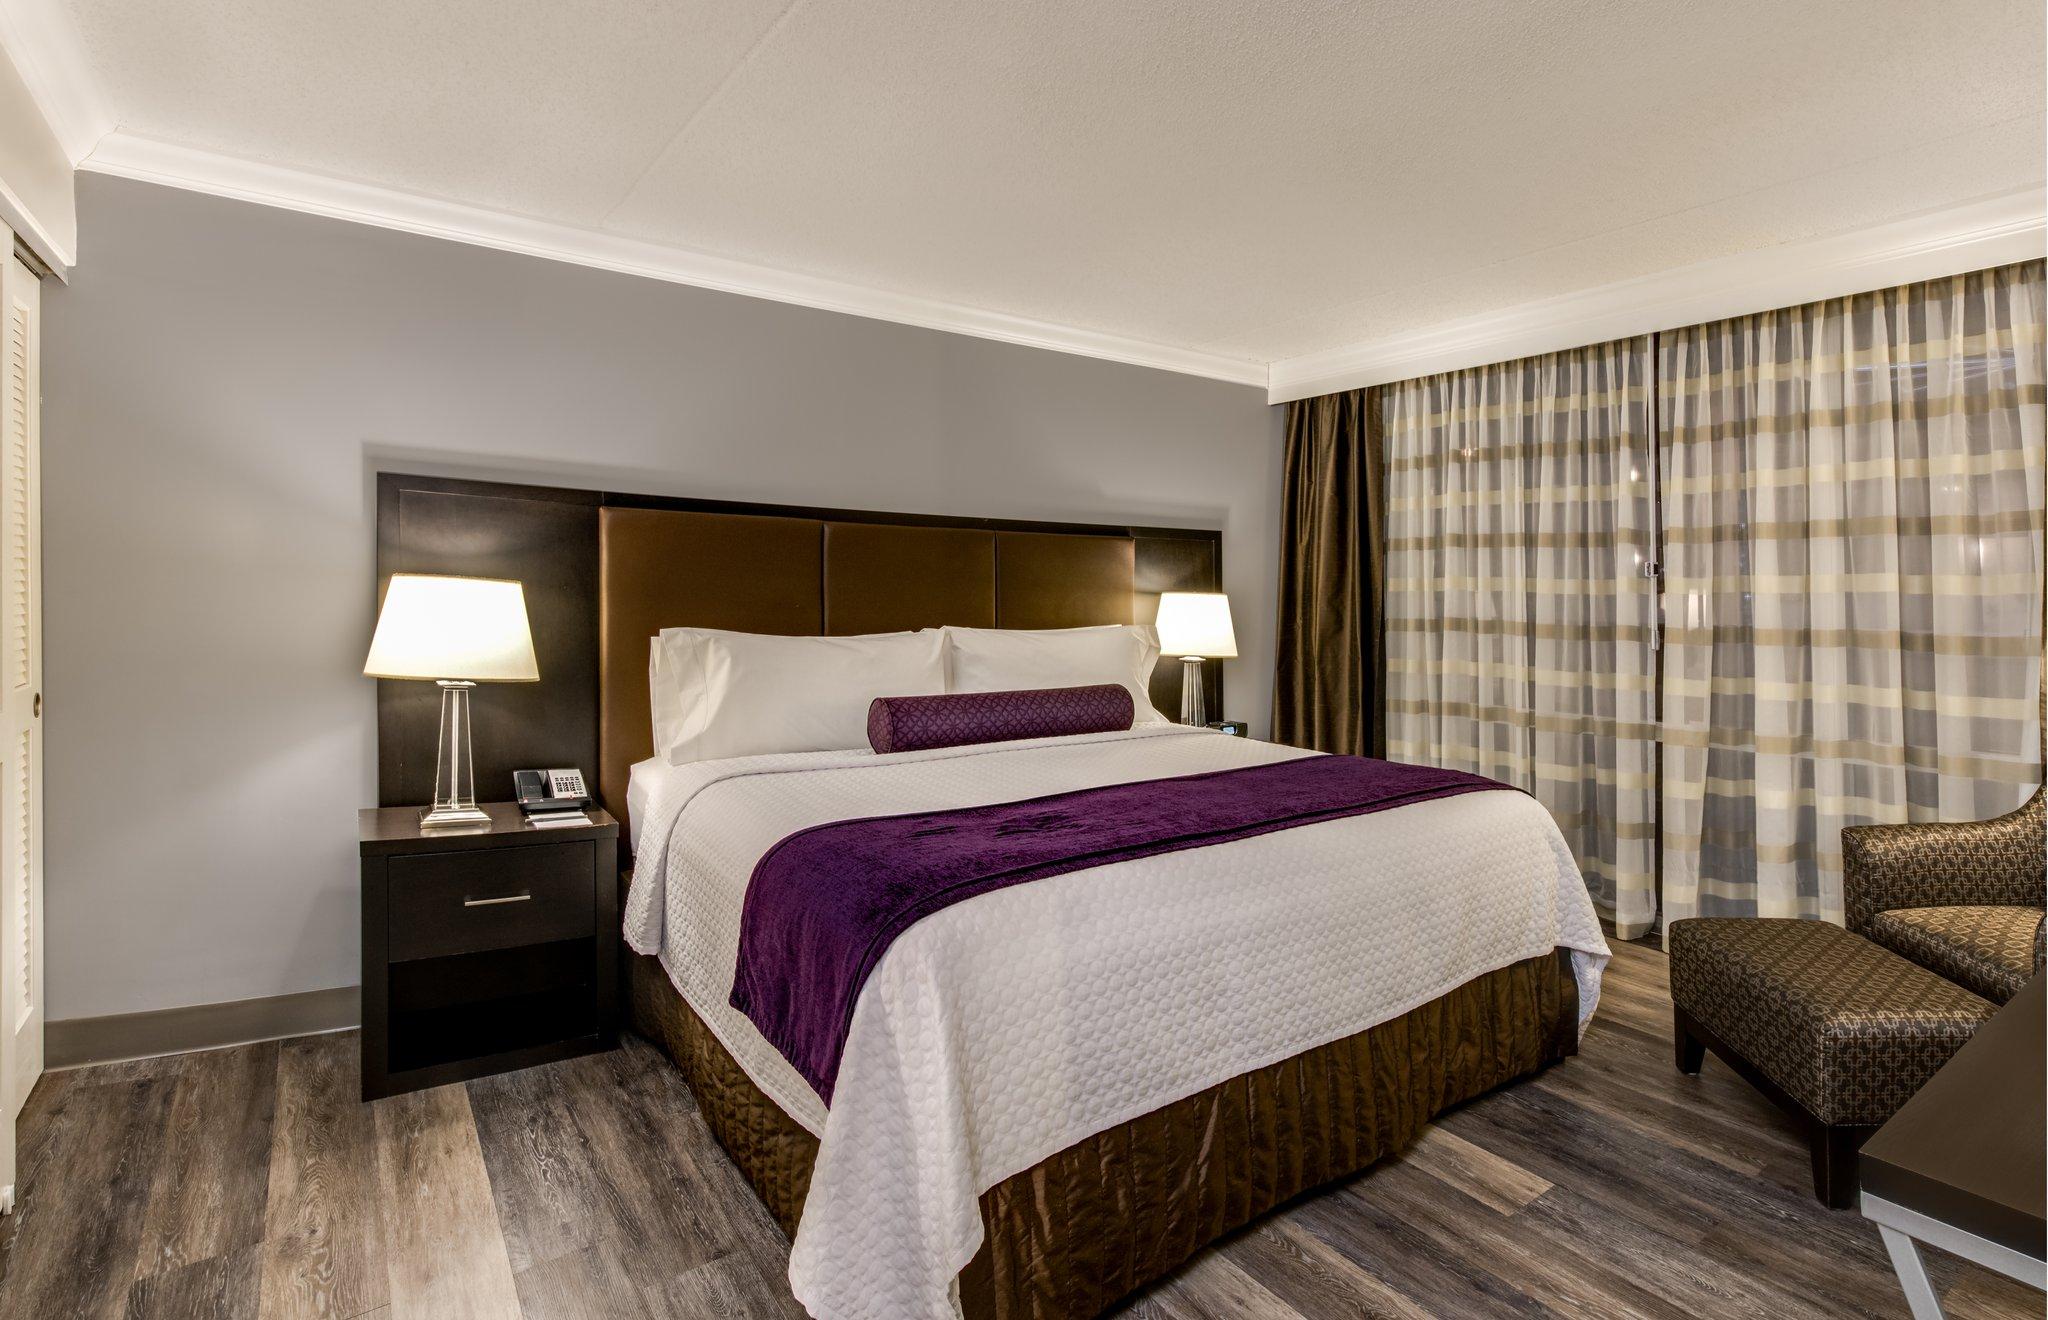 Hotel in Suffern NY | Crowne Plaza Suffern Mahwah